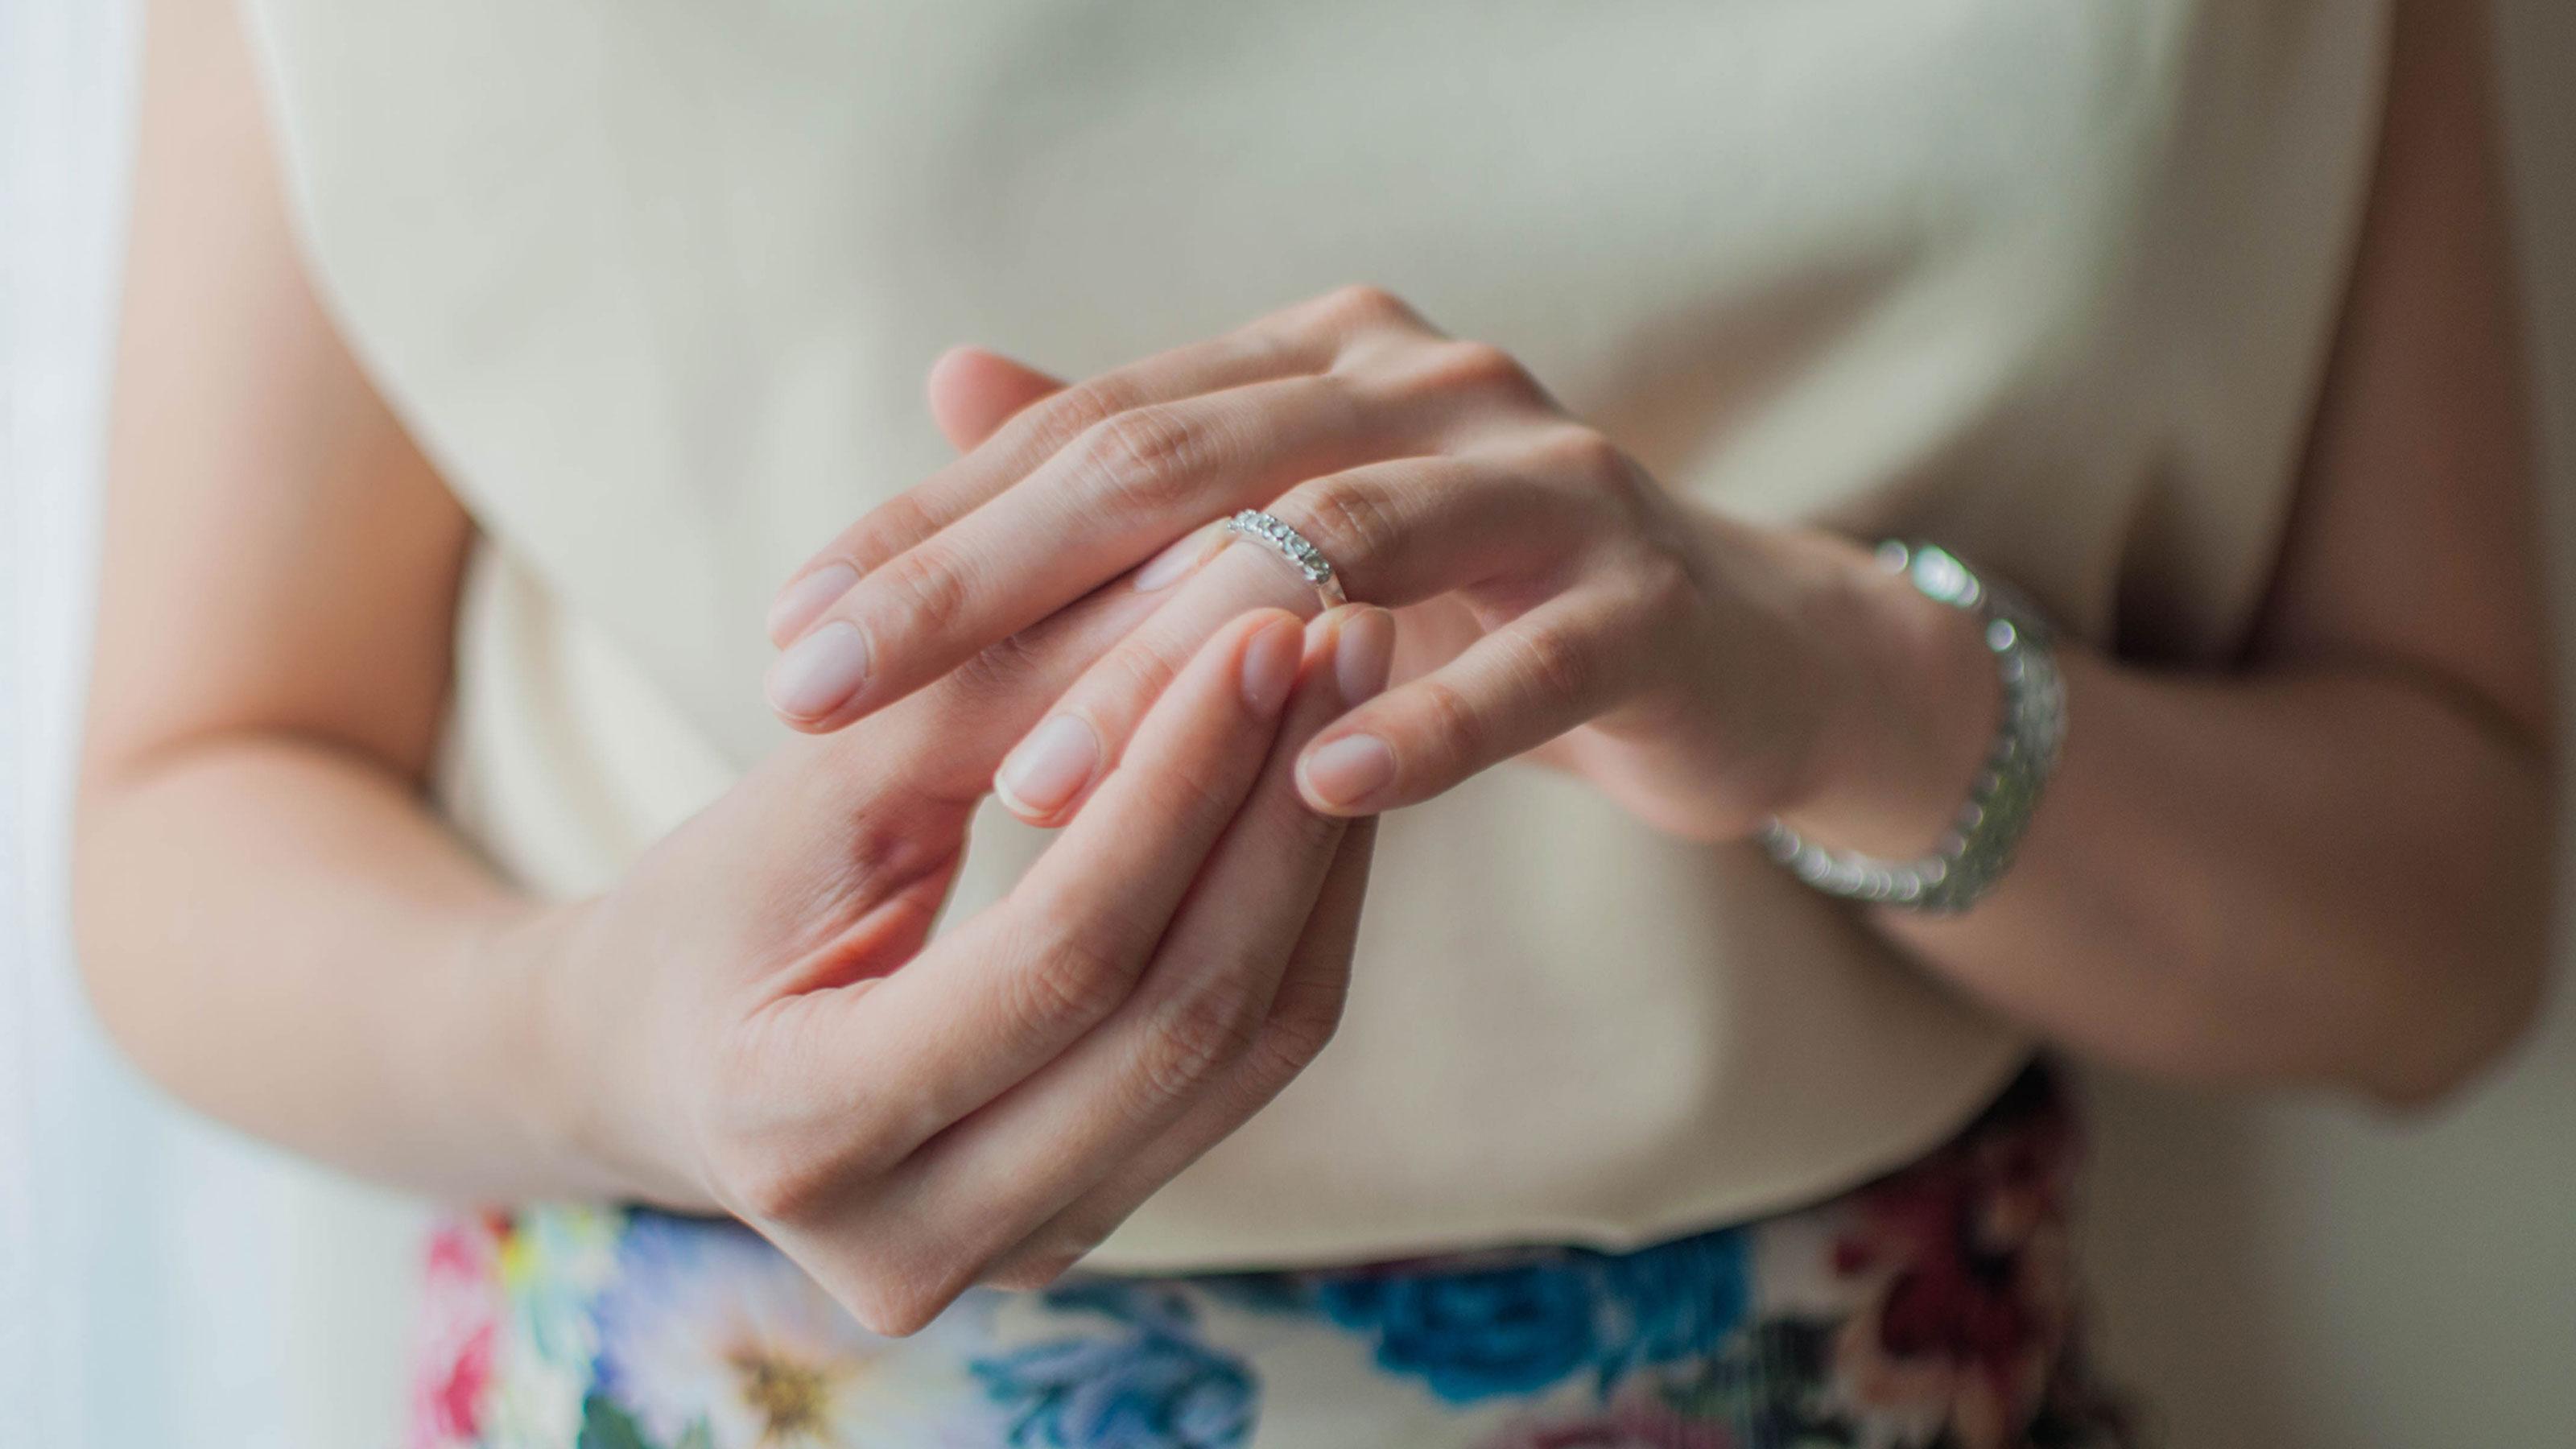 Divorcing? 7 Tips for Financial Clarity During a Turbulent Time | Kiplinger